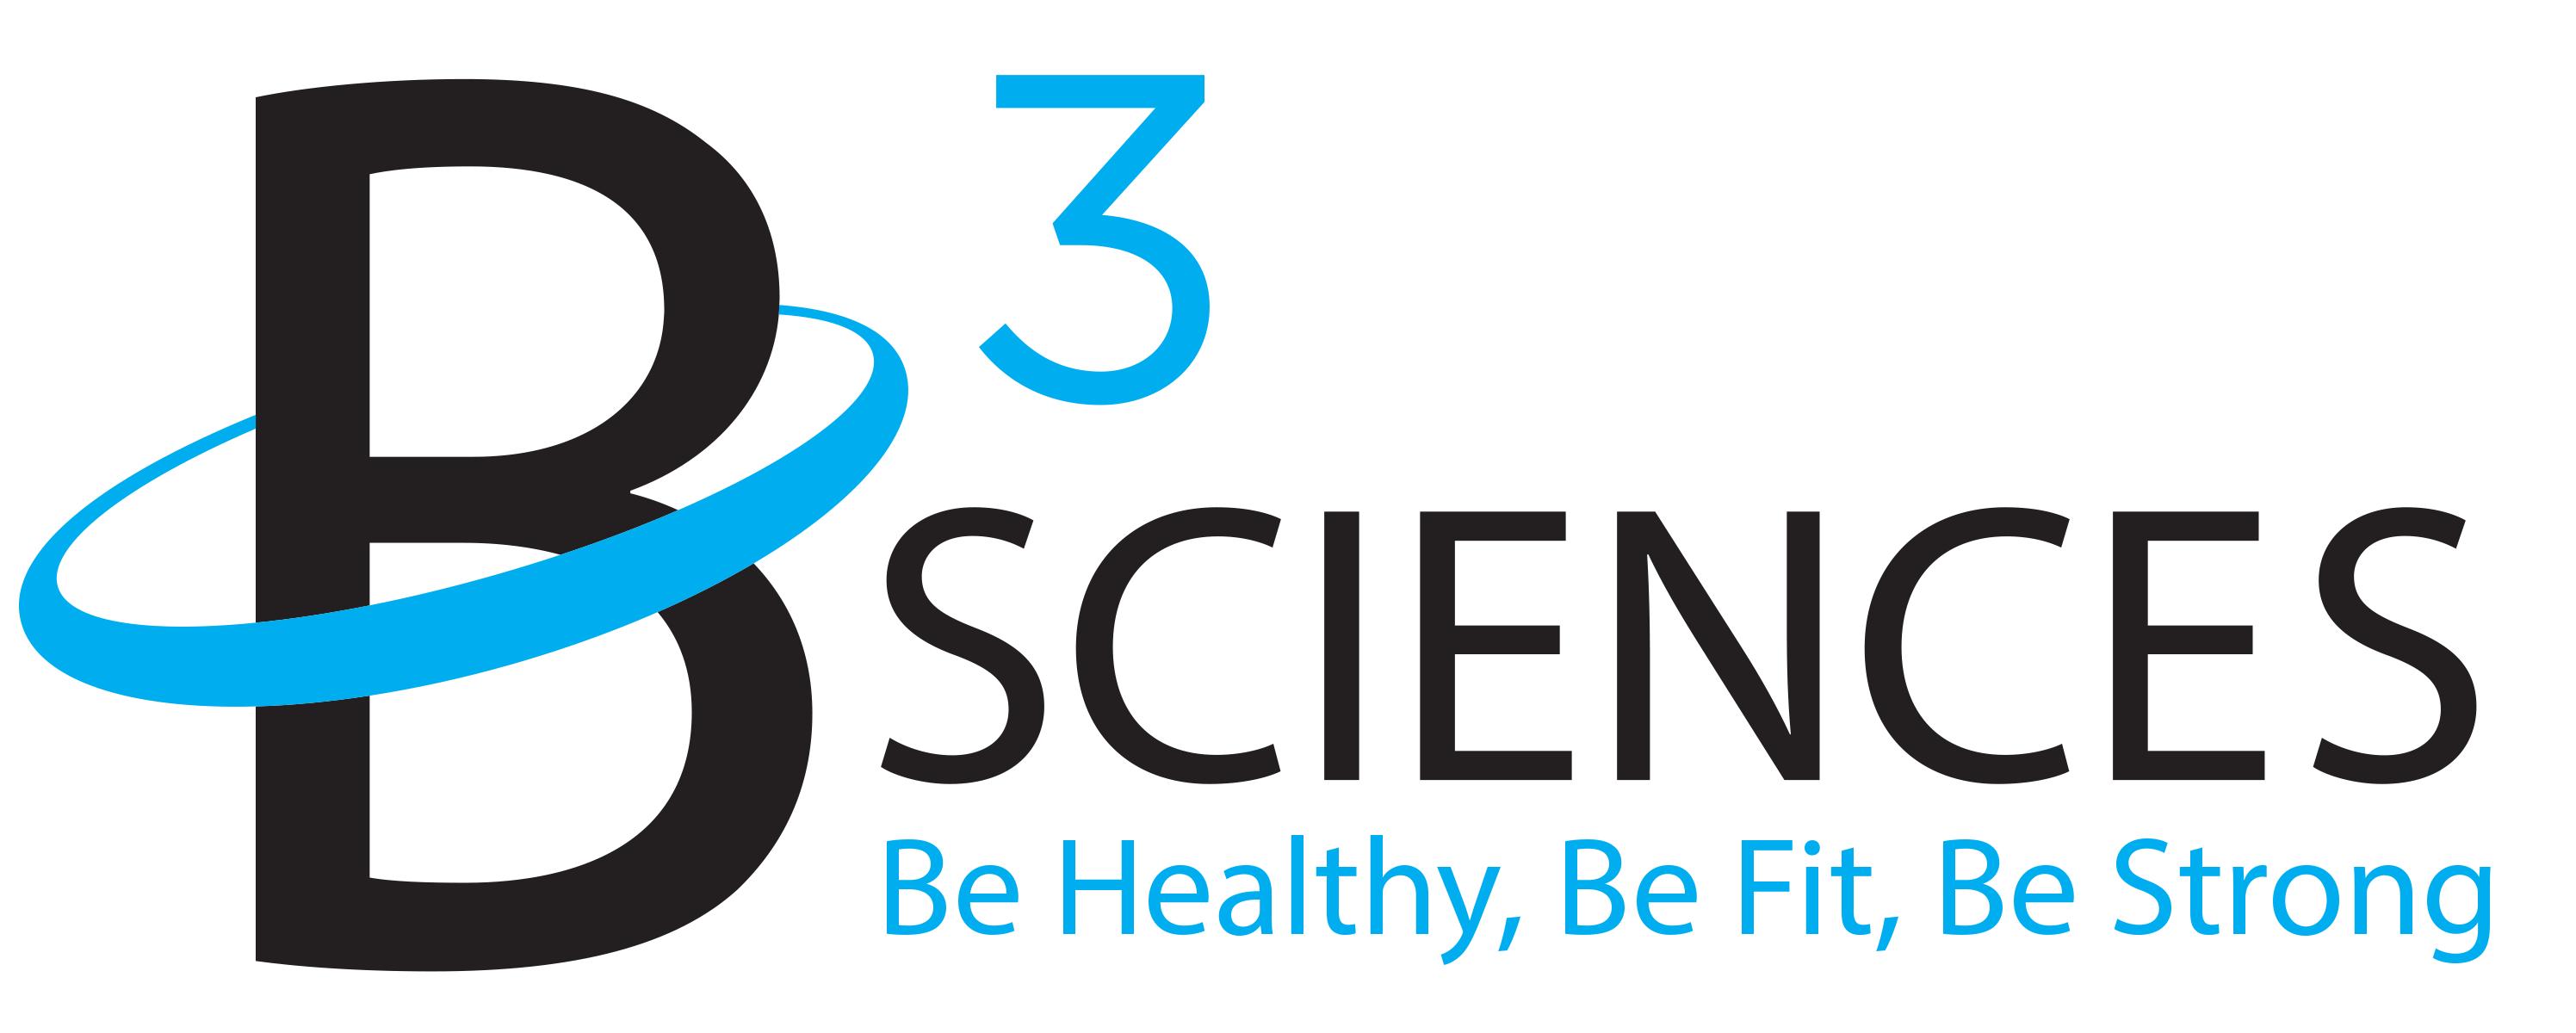 b3-sciences-logo